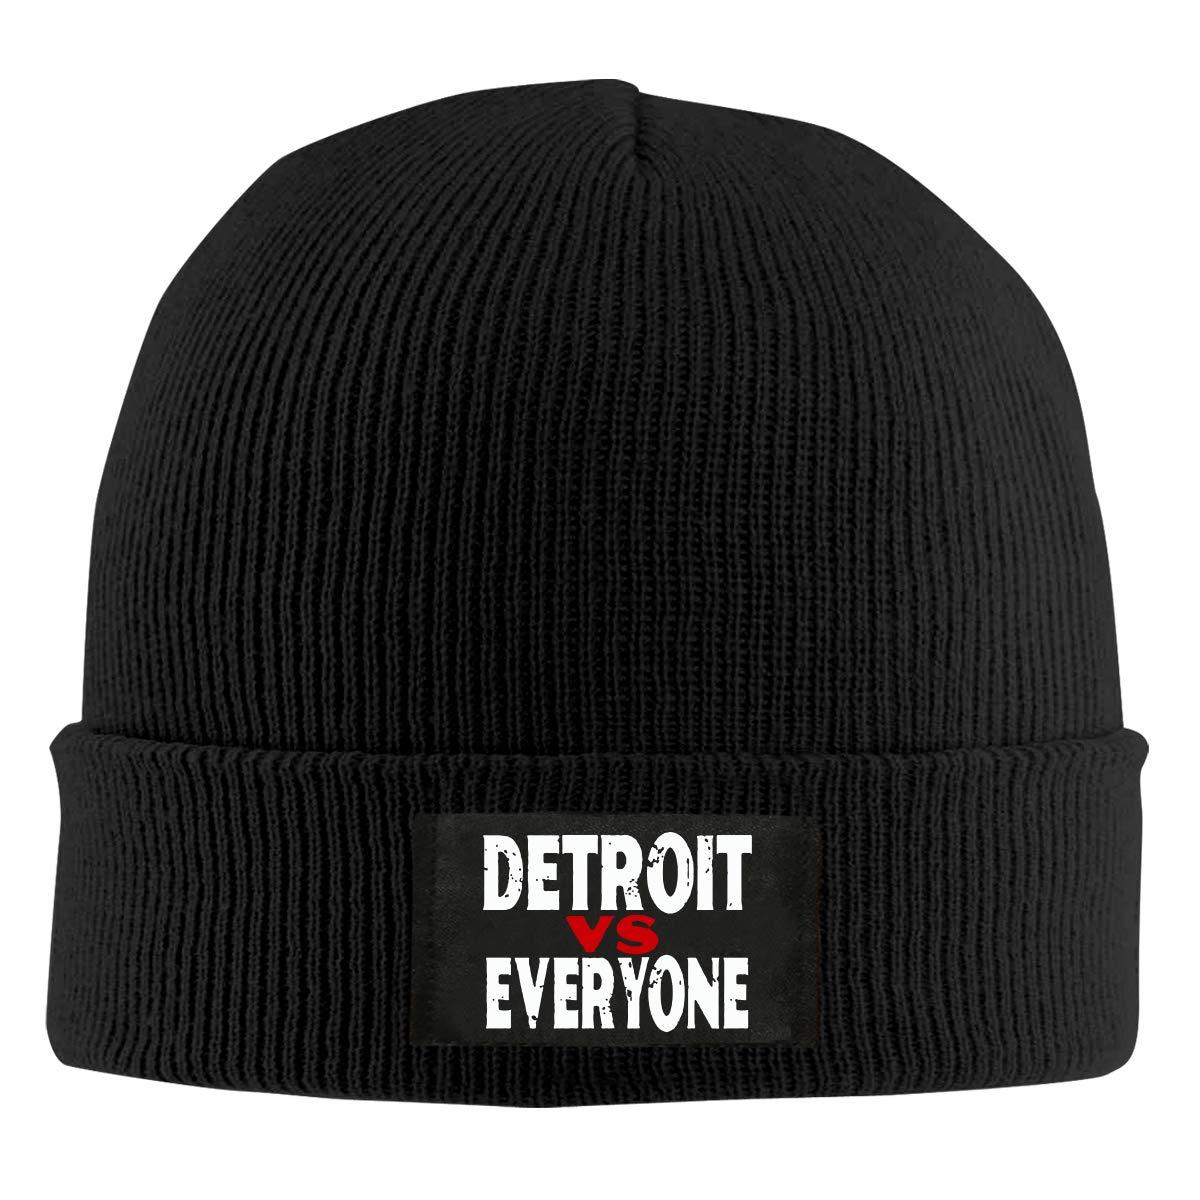 Detroit Vs Everyone Men /& Womens Knitted Hat Fashion Warm Beanie Cap